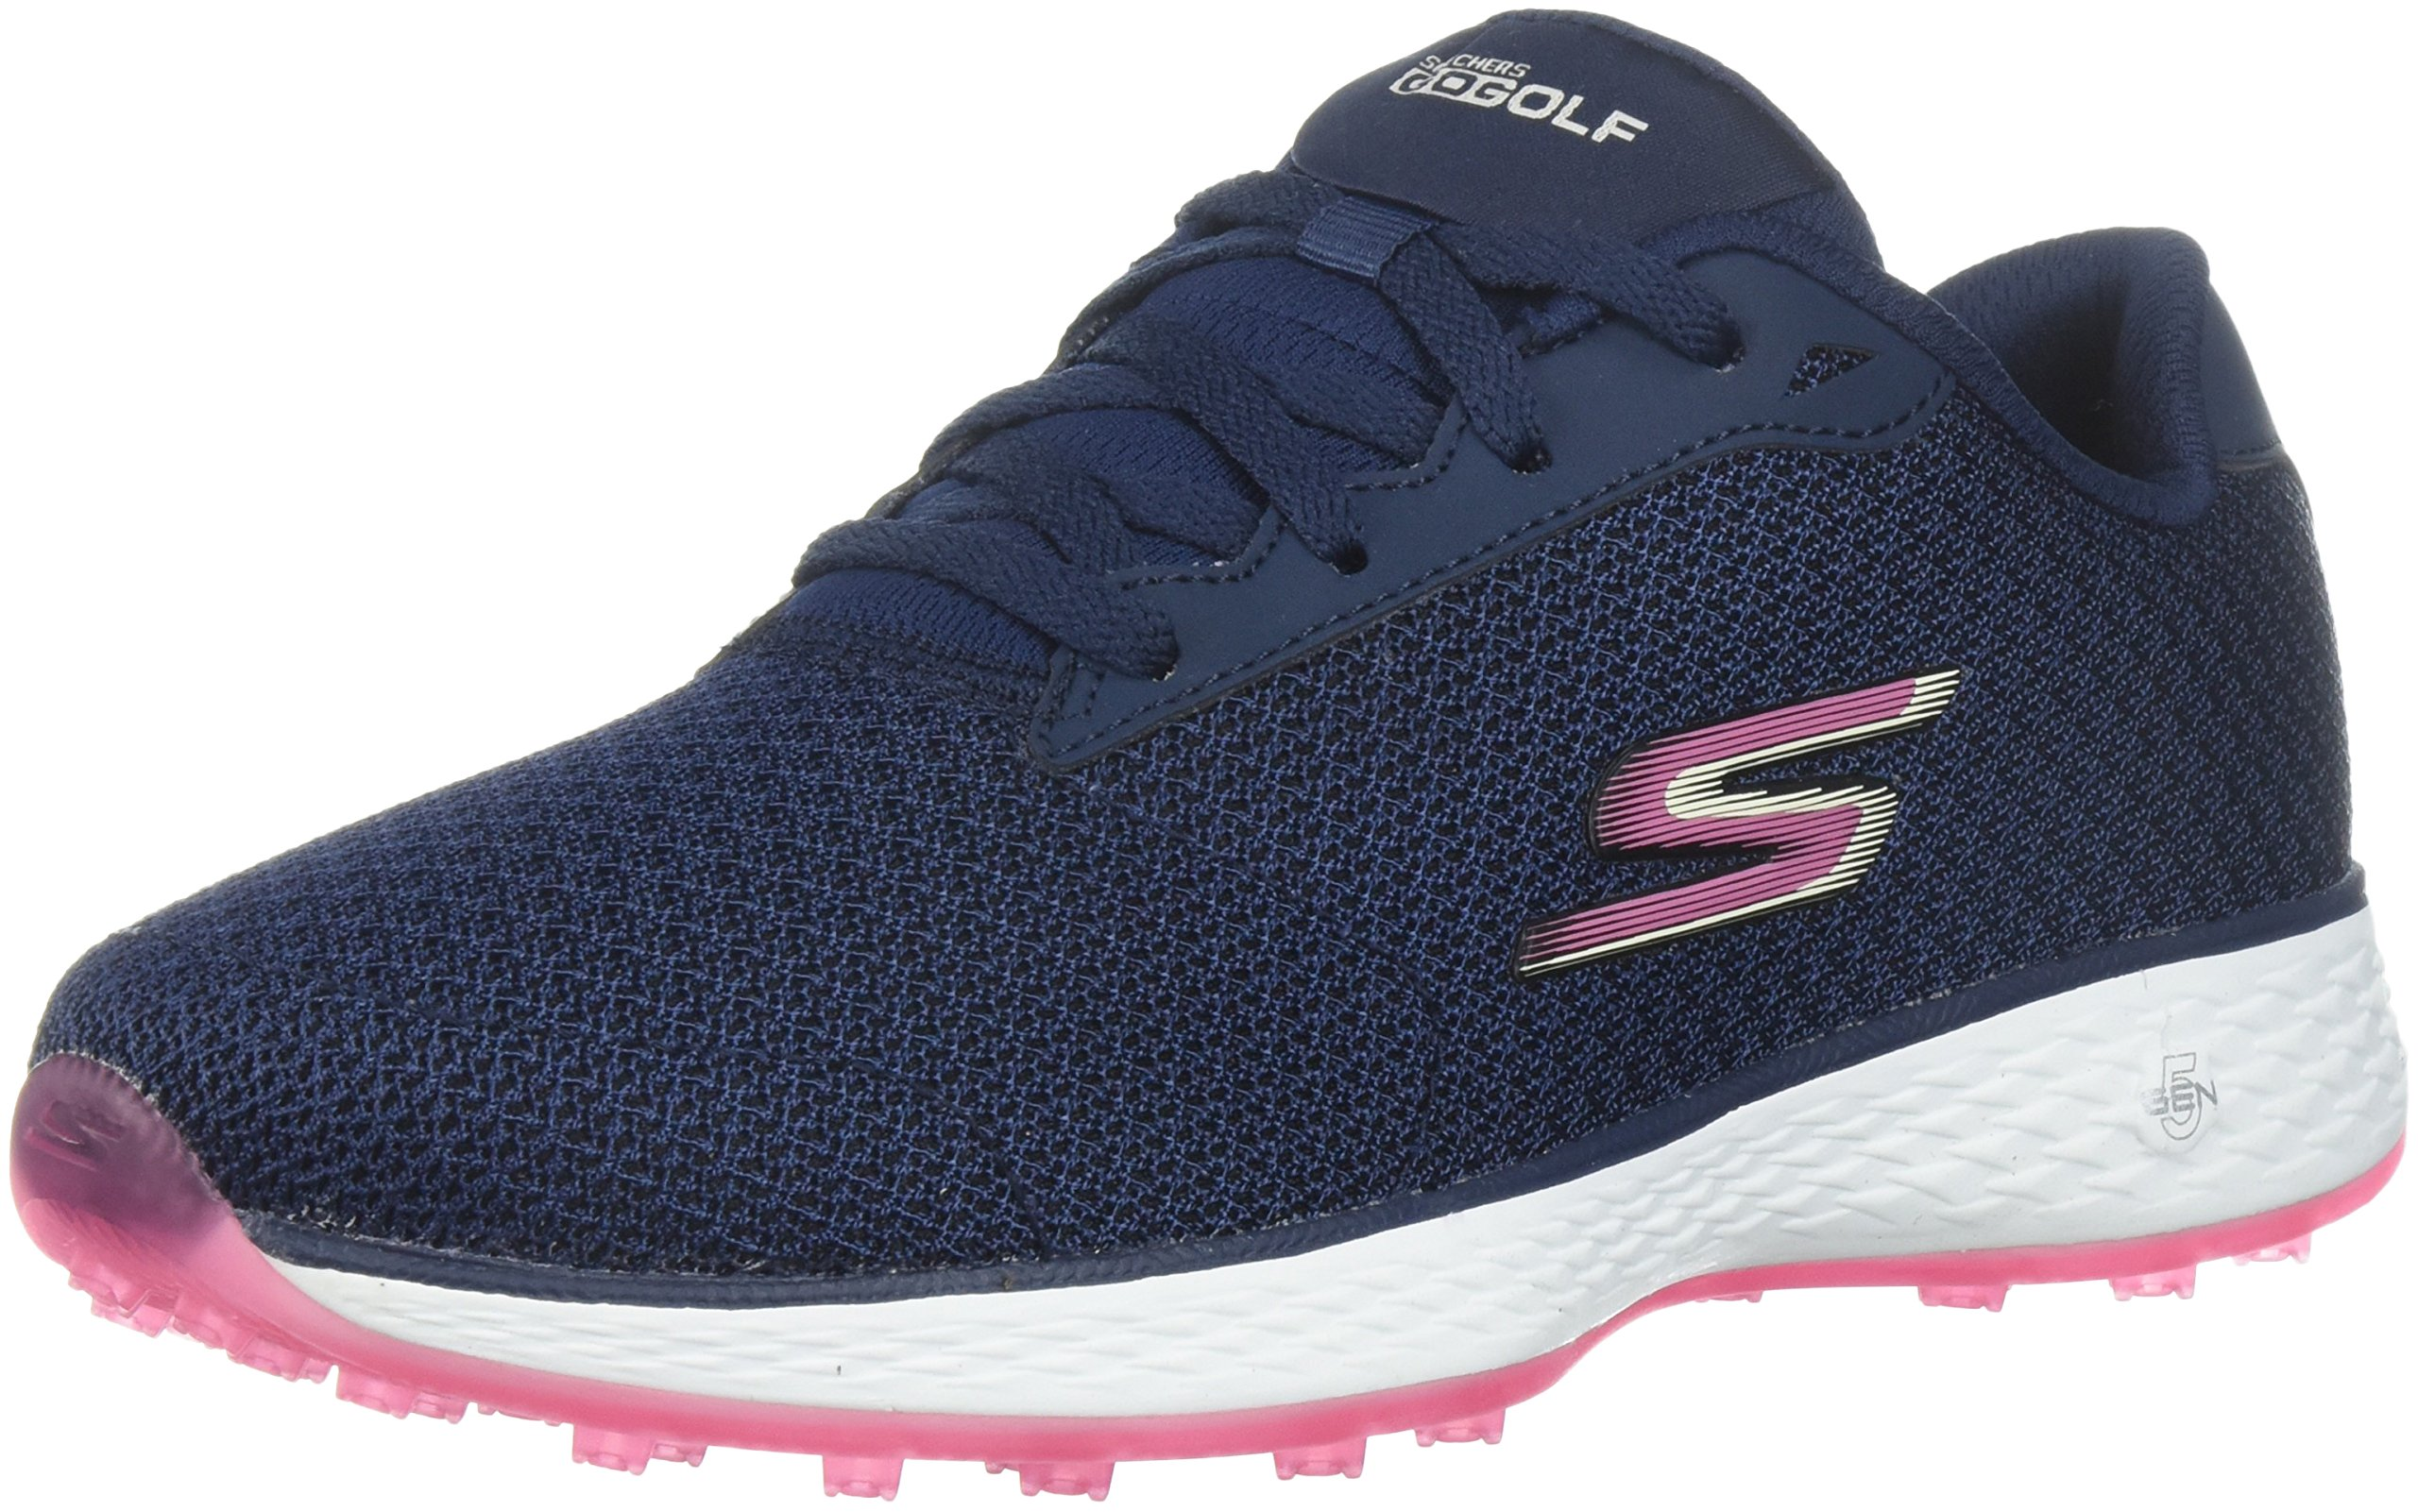 Skechers Performance Women's Go Golf Birdie Golf Shoe, Navy/Pink, 7 W US